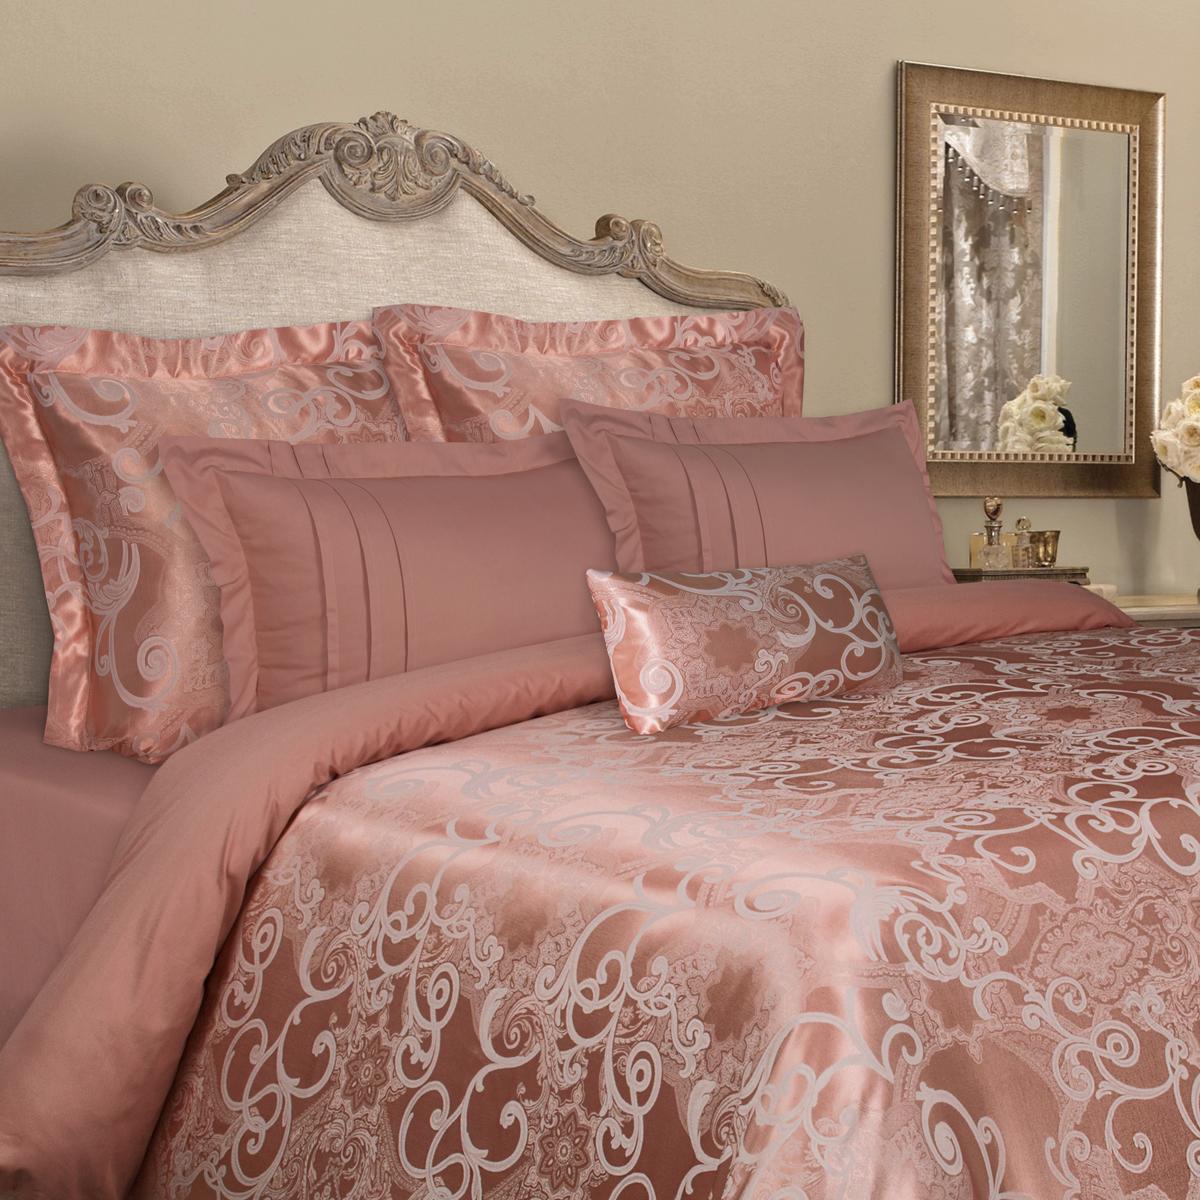 Комплект белья Mona Liza Elite, 2-спальный, наволочки 50х70, 70х70. 5538-24